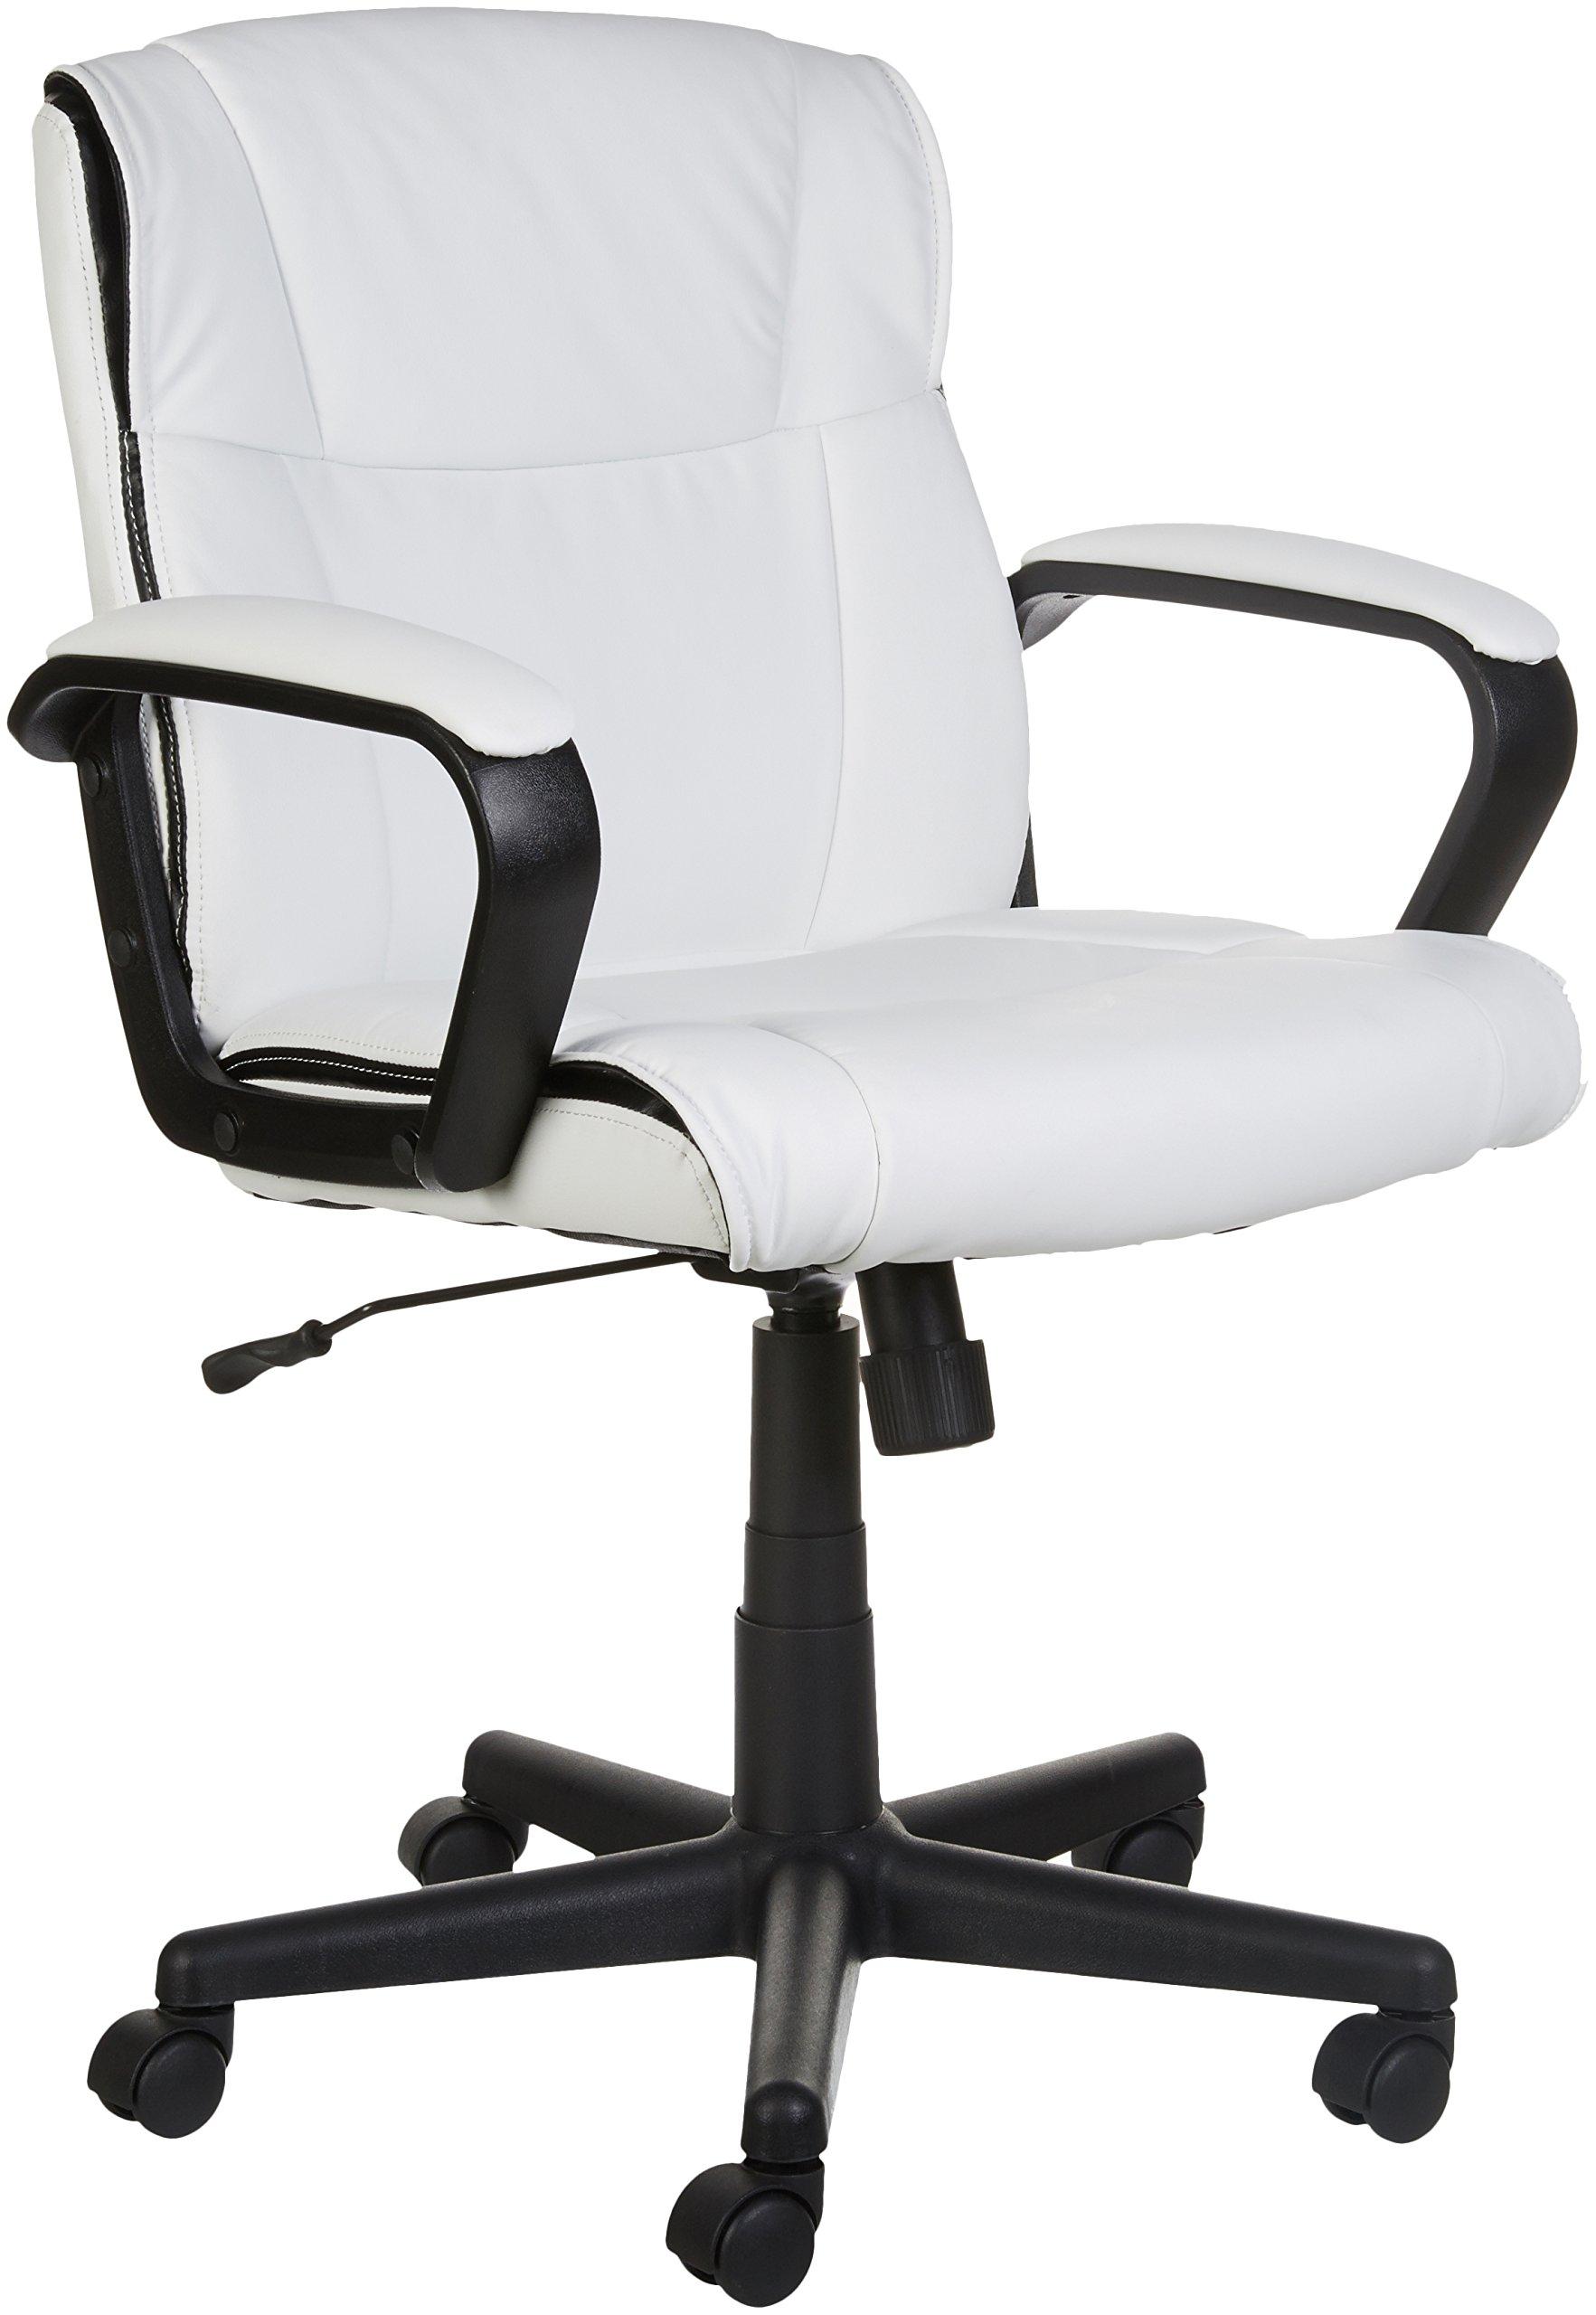 AmazonBasics Classic Leather-Padded Mid-Back Office Chair with Armrest - White by AmazonBasics (Image #2)